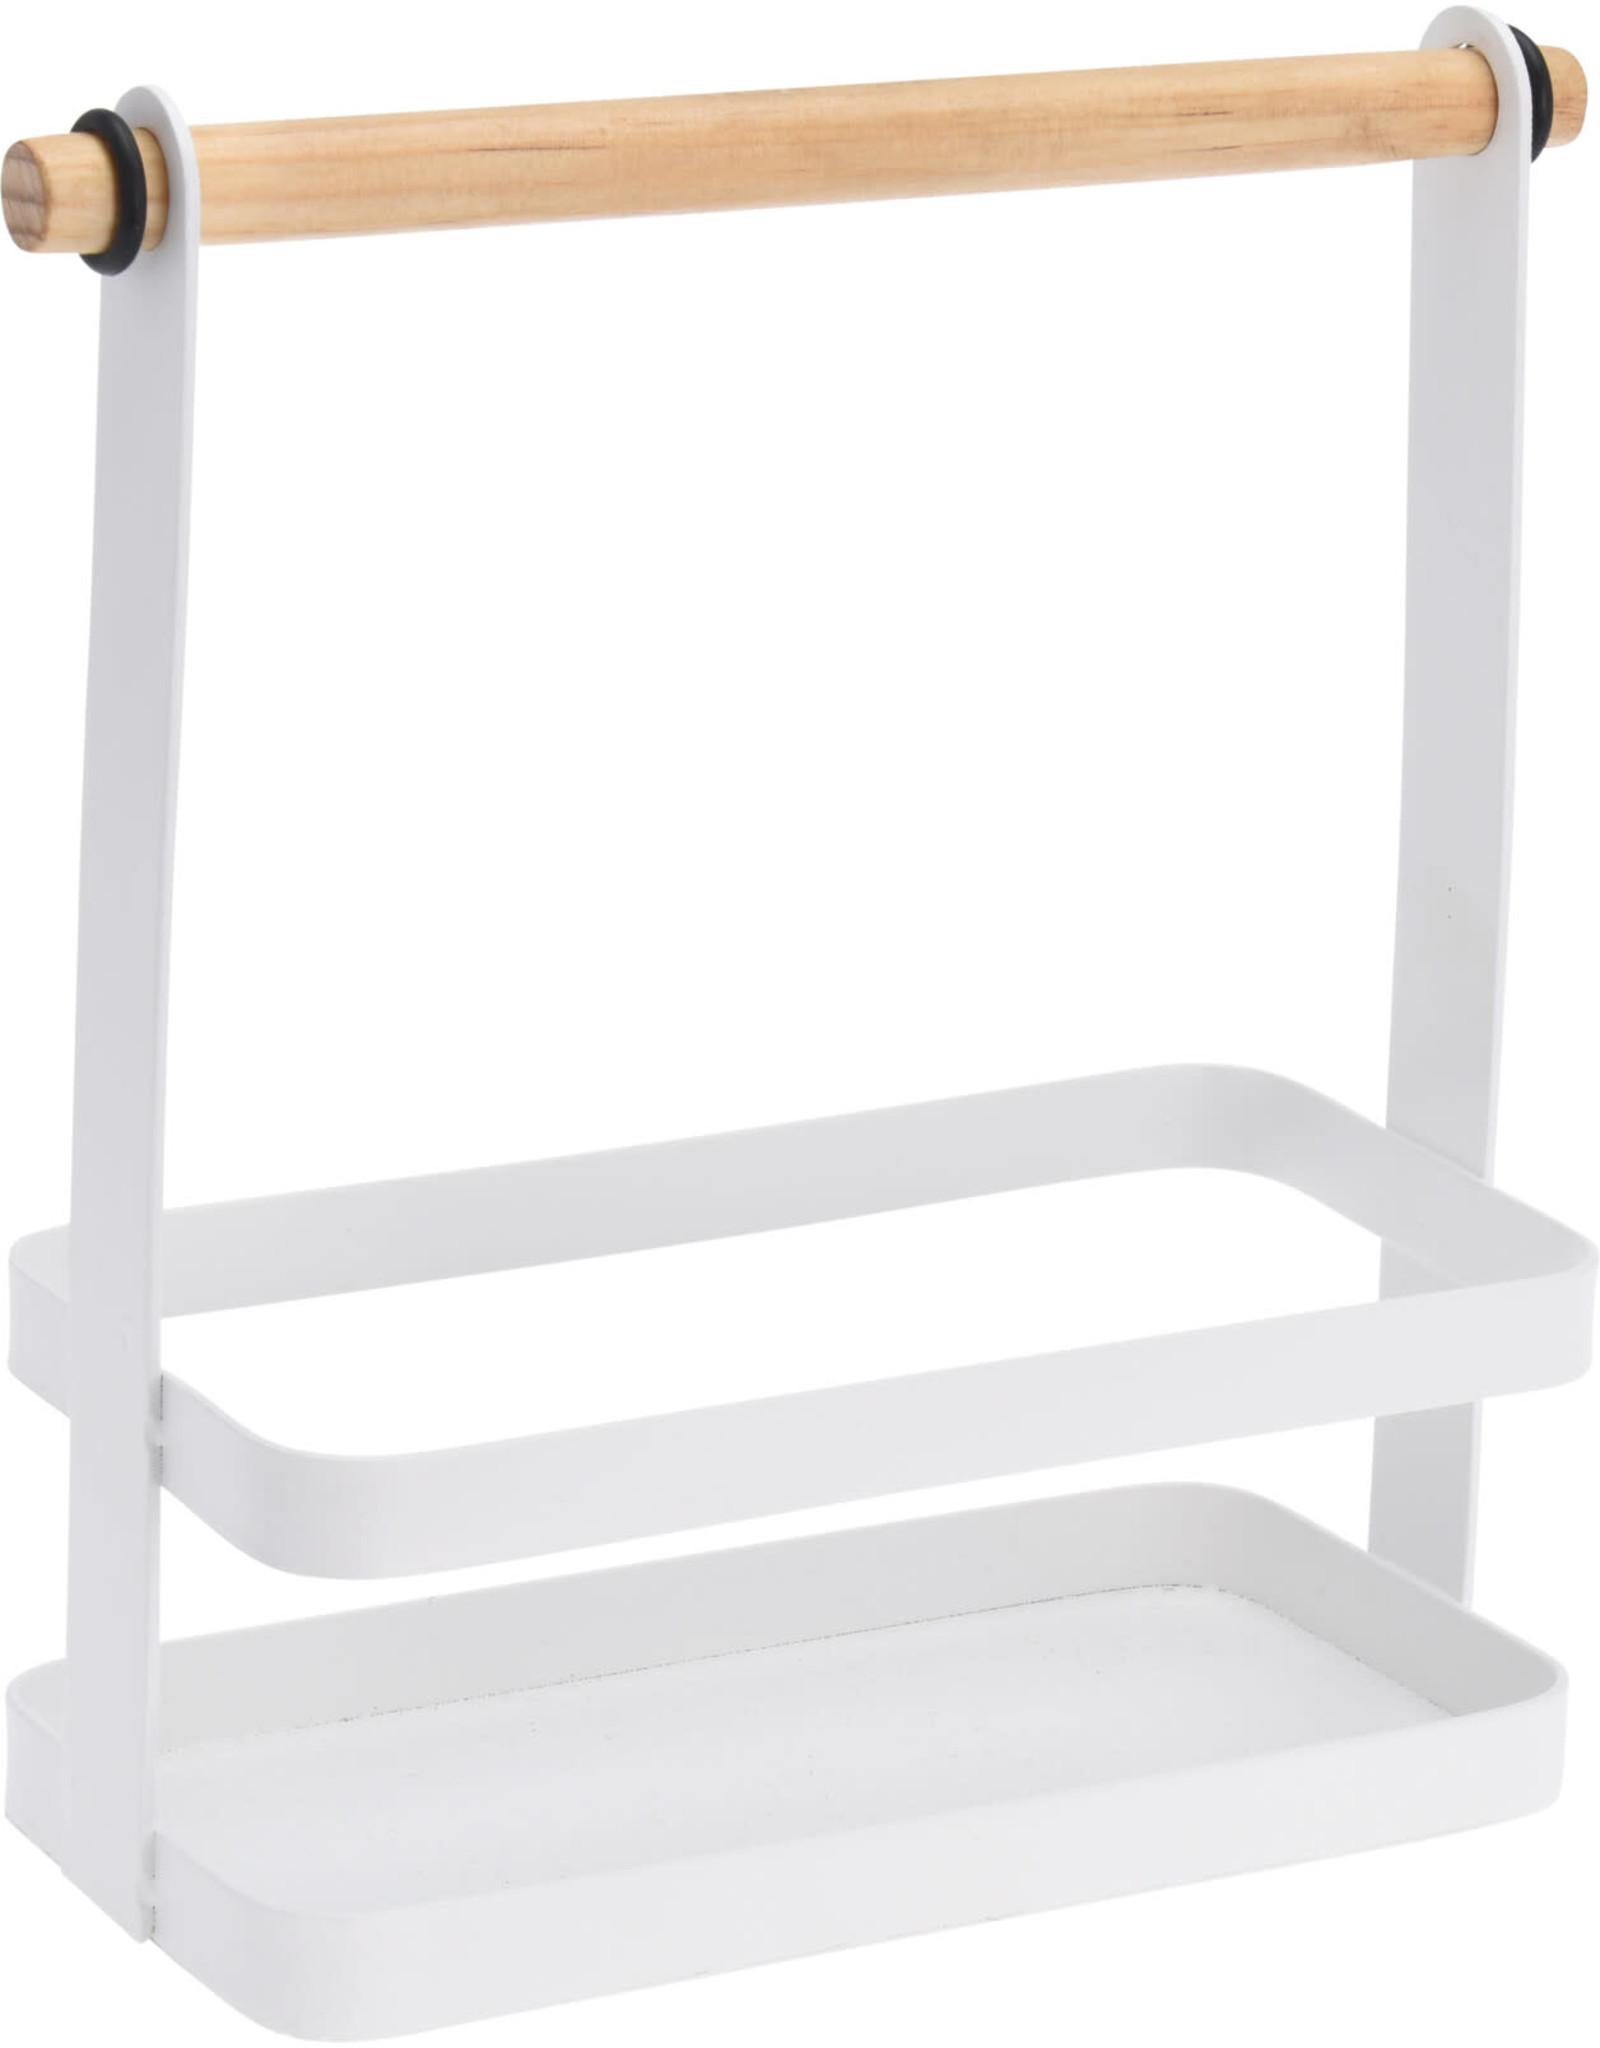 Koopman Basket Metal 20X10X25Cm